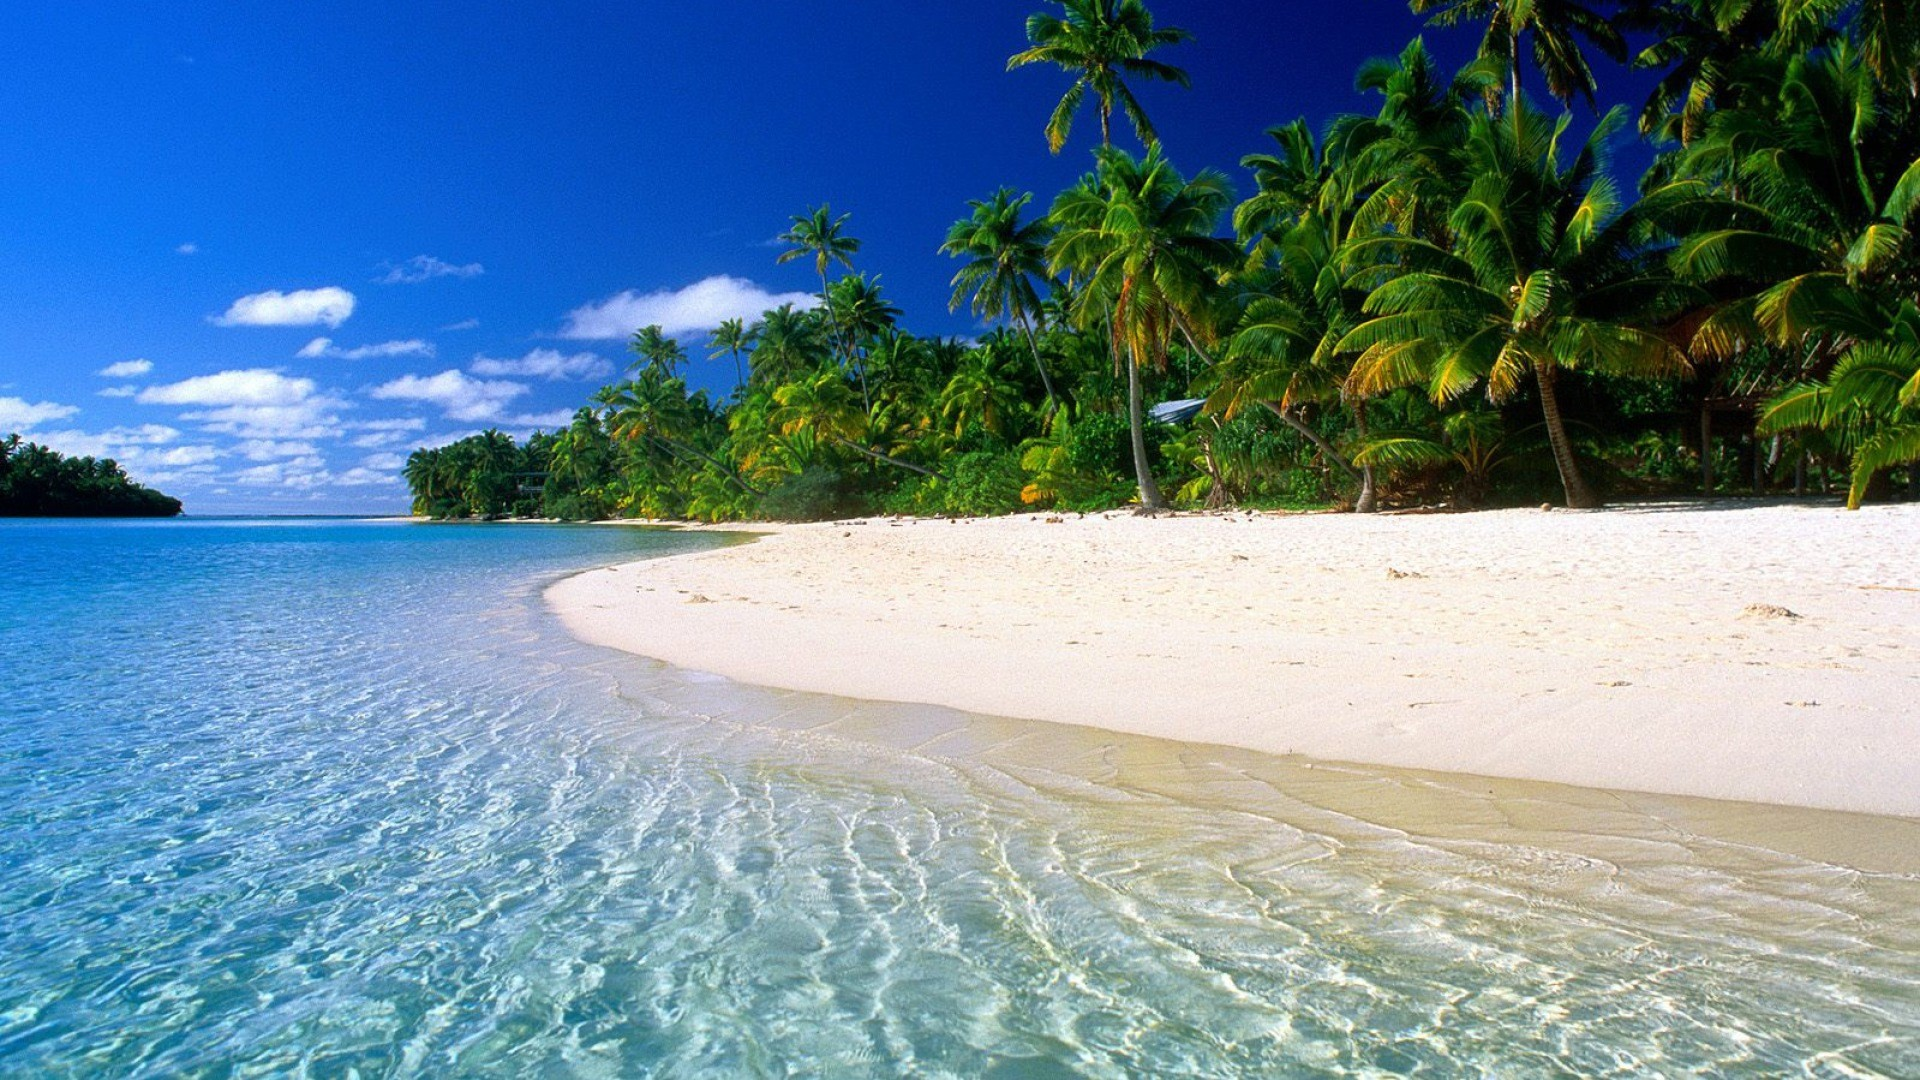 beach free hd widescreen 1920×1080